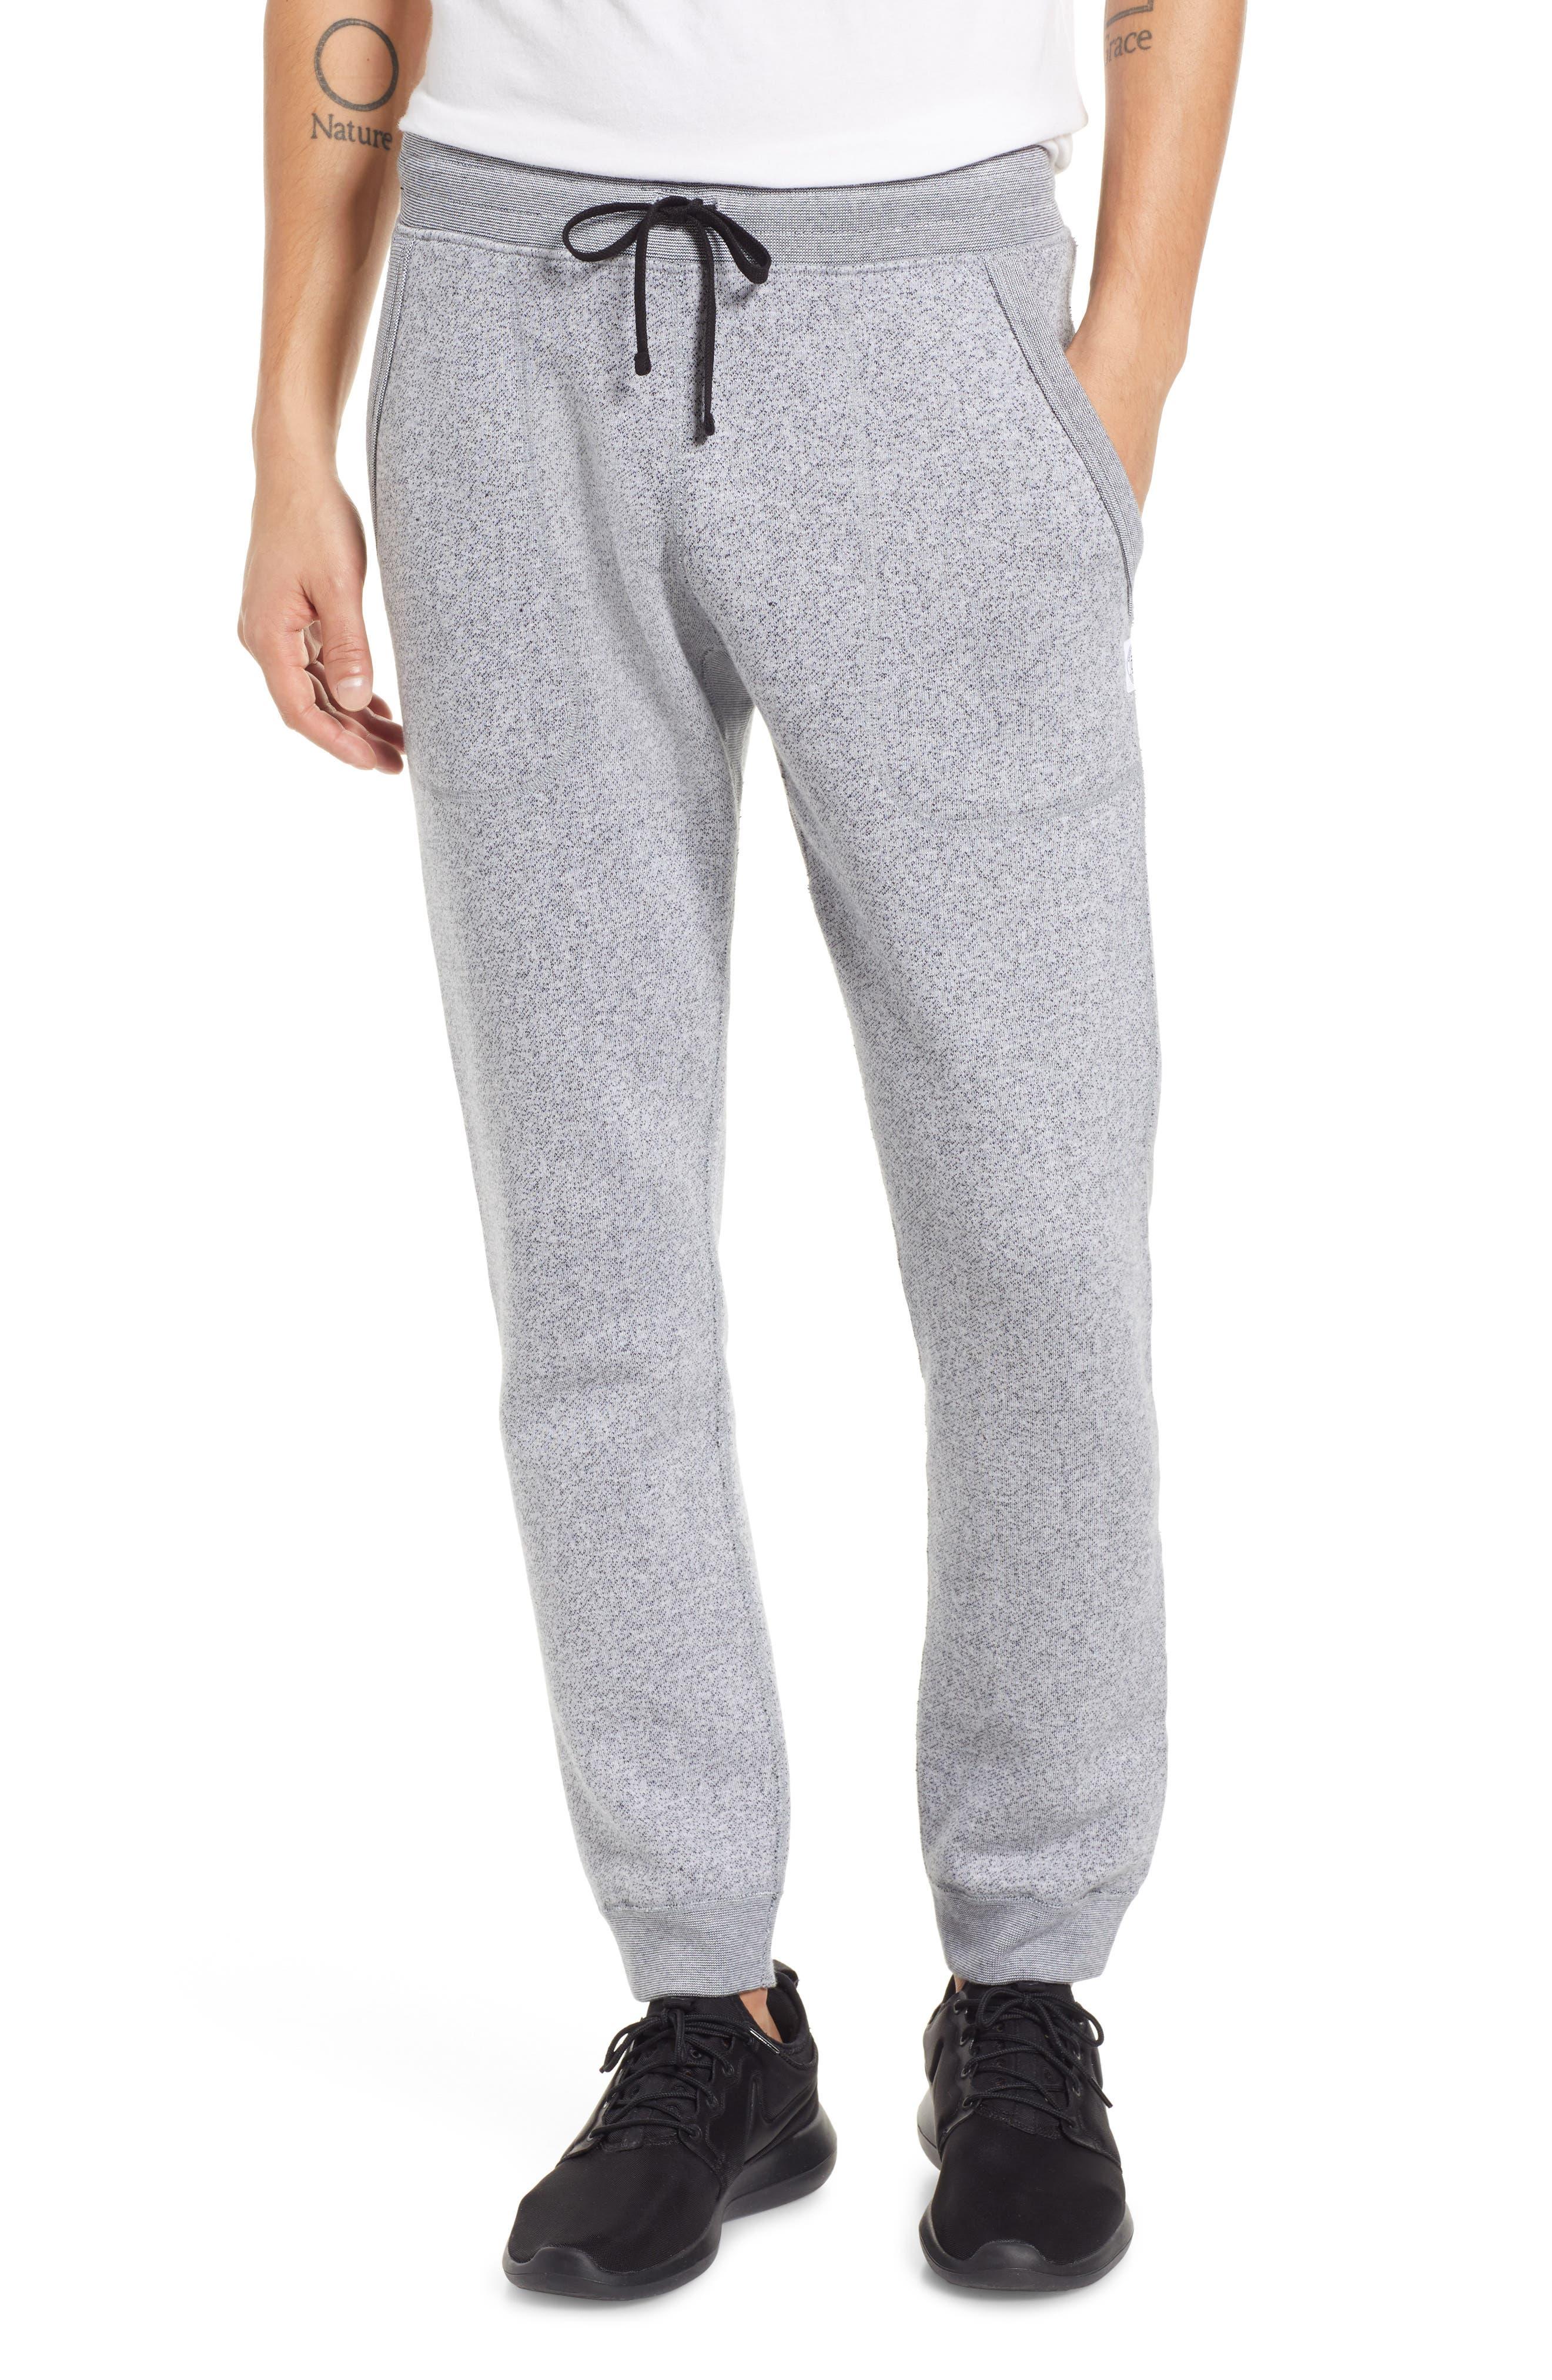 Tiger Slim Jogger Sweatpants,                             Main thumbnail 1, color,                             WHITE